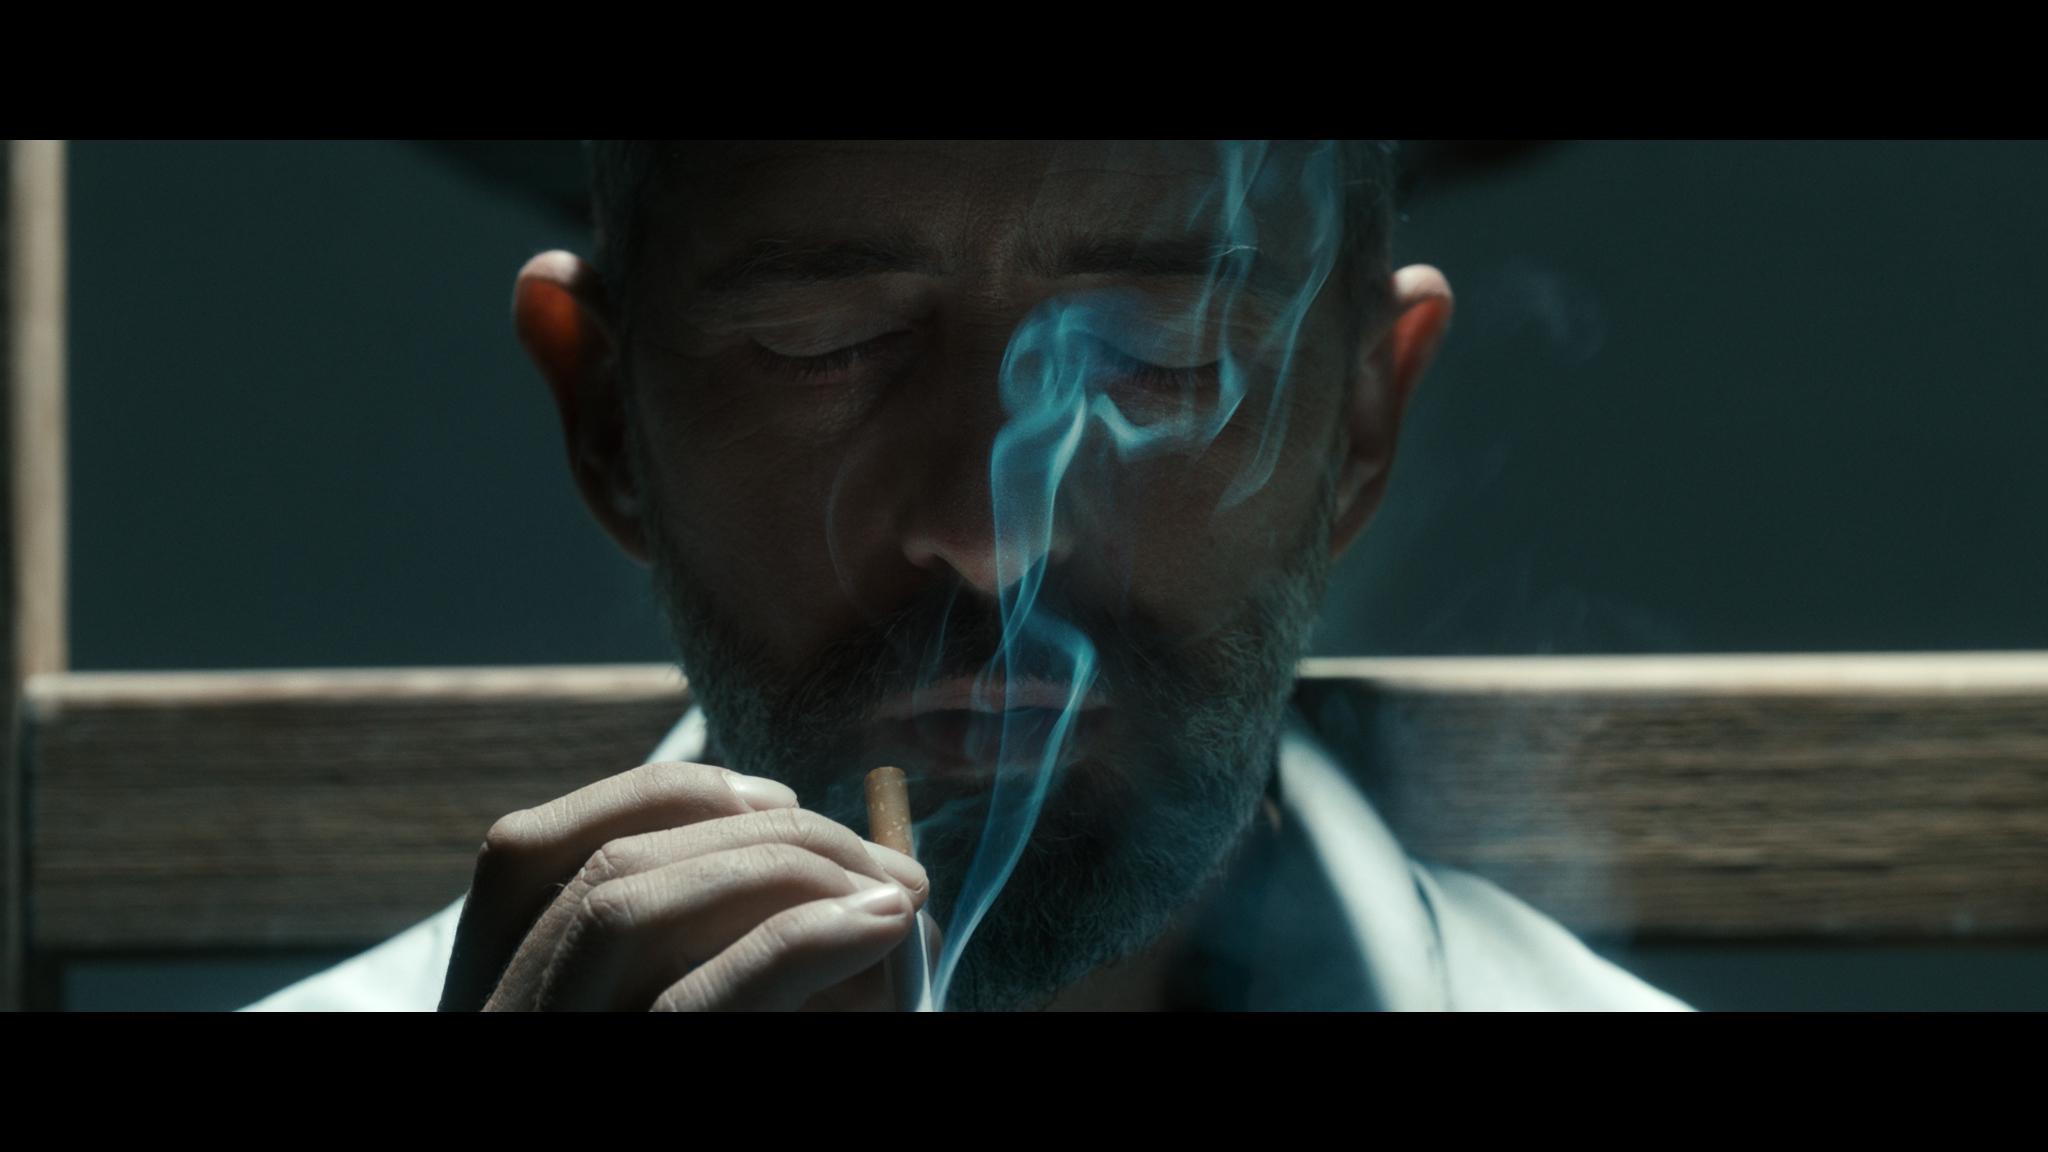 Court métrage EN PAIX de Hugo Germser, Daniel Sebaihia (2019)